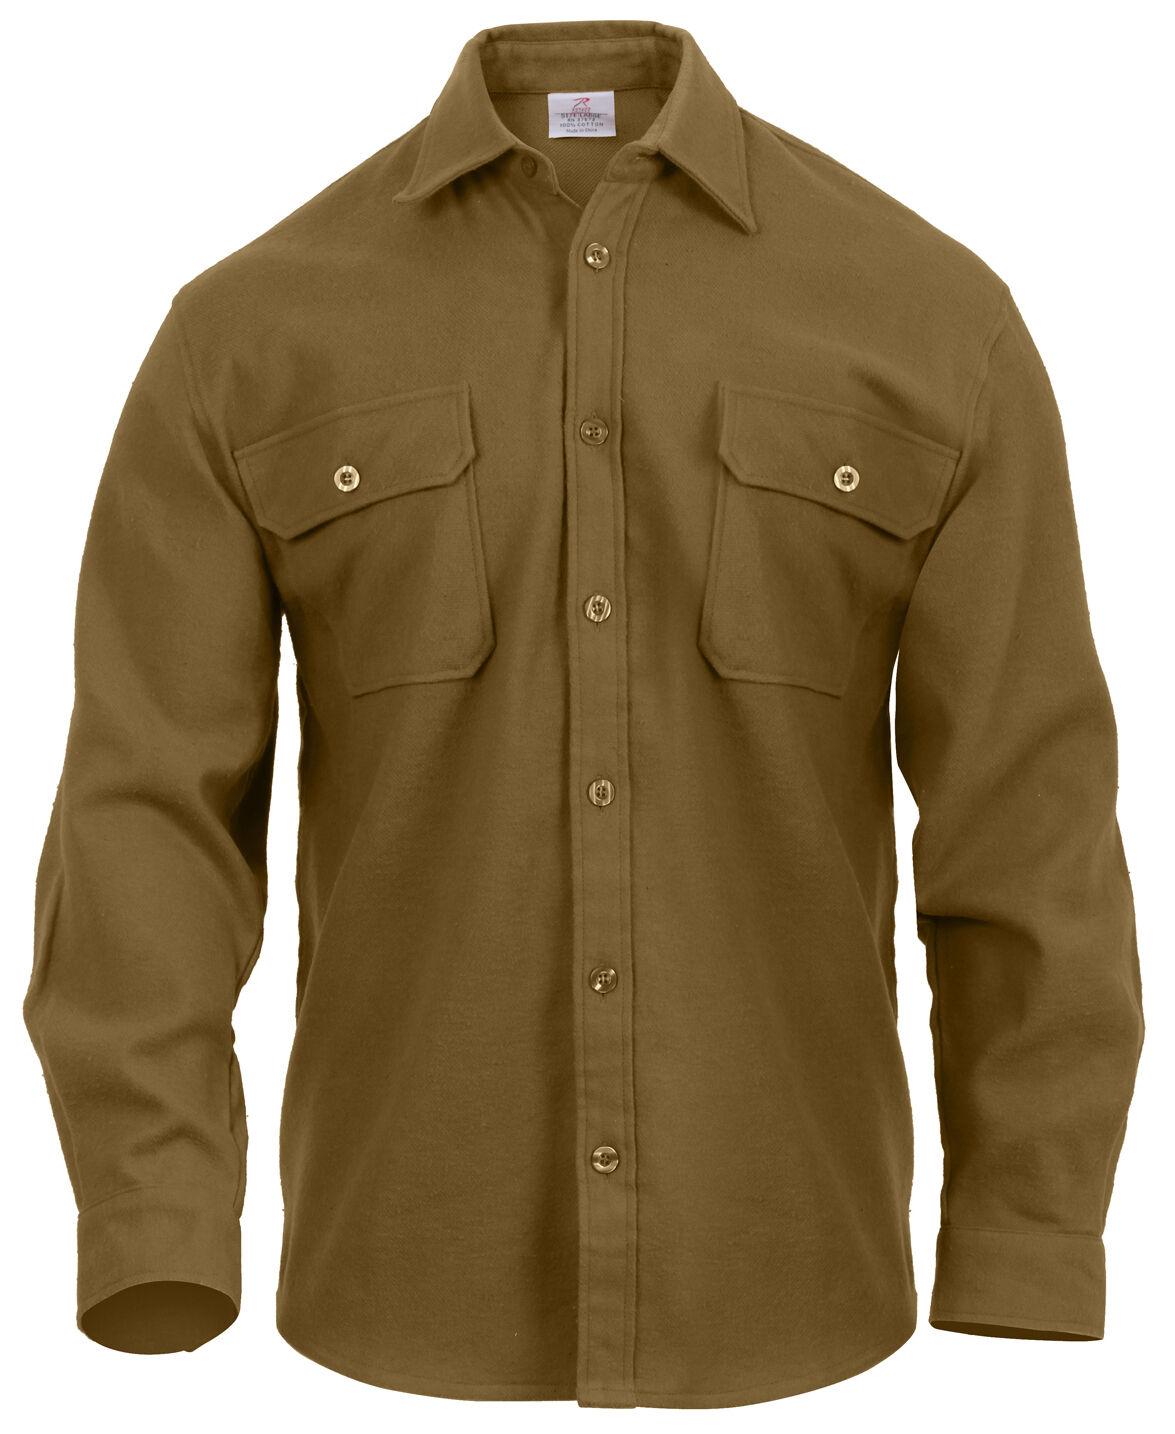 Mens Flannel Shirts Long Sleeve Shirt Heavyweight Coyote Brown redhco 4761